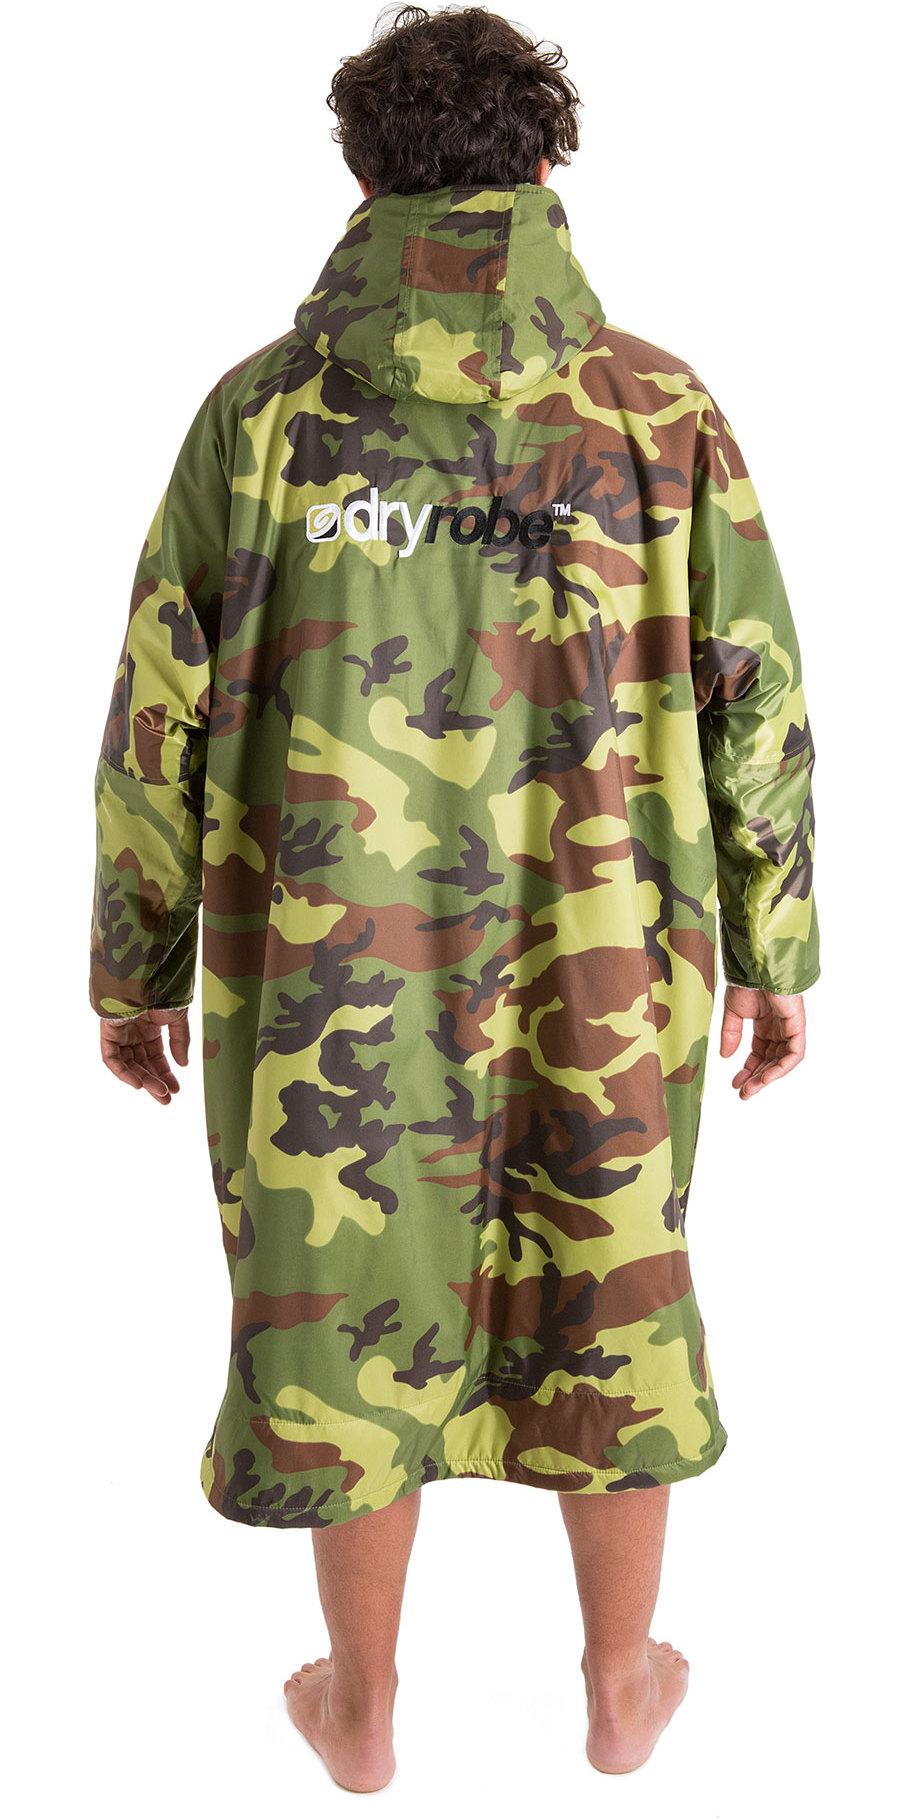 2019 Dryrobe Advance Long Sleeve Premium Outdoor Change Robe / Poncho DR104 Camo / Grey